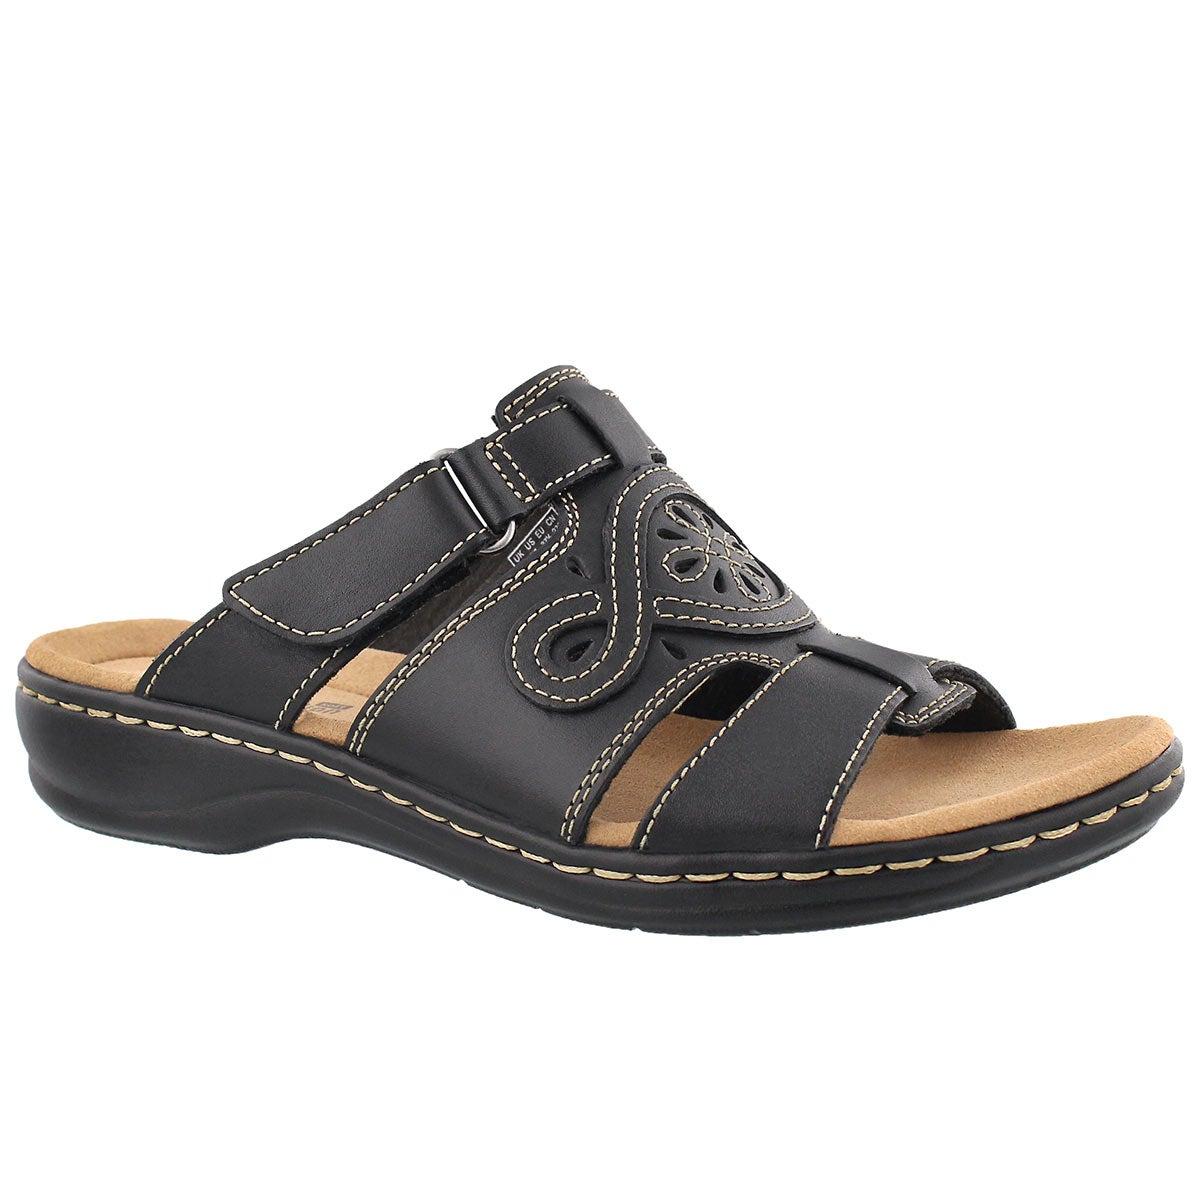 Women's LEISA HIGLEY black casual slide sandals